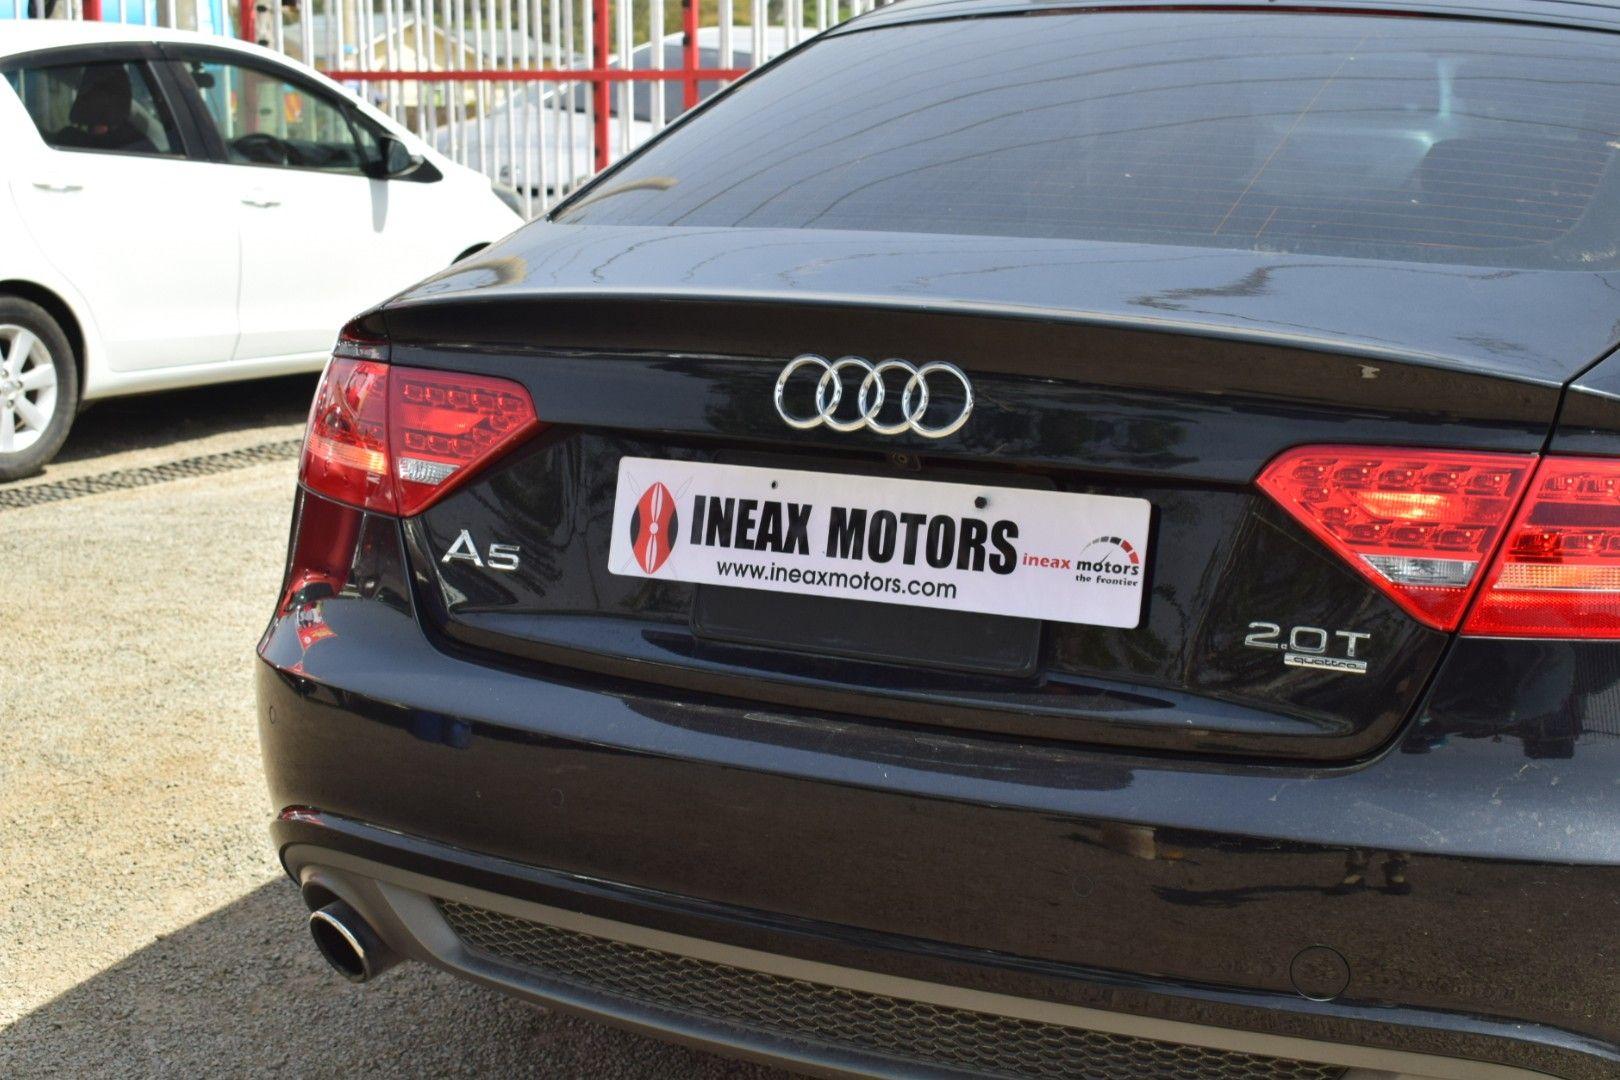 Audi A5 Sline Quattro Ineax Motors Kenya Limited Audi